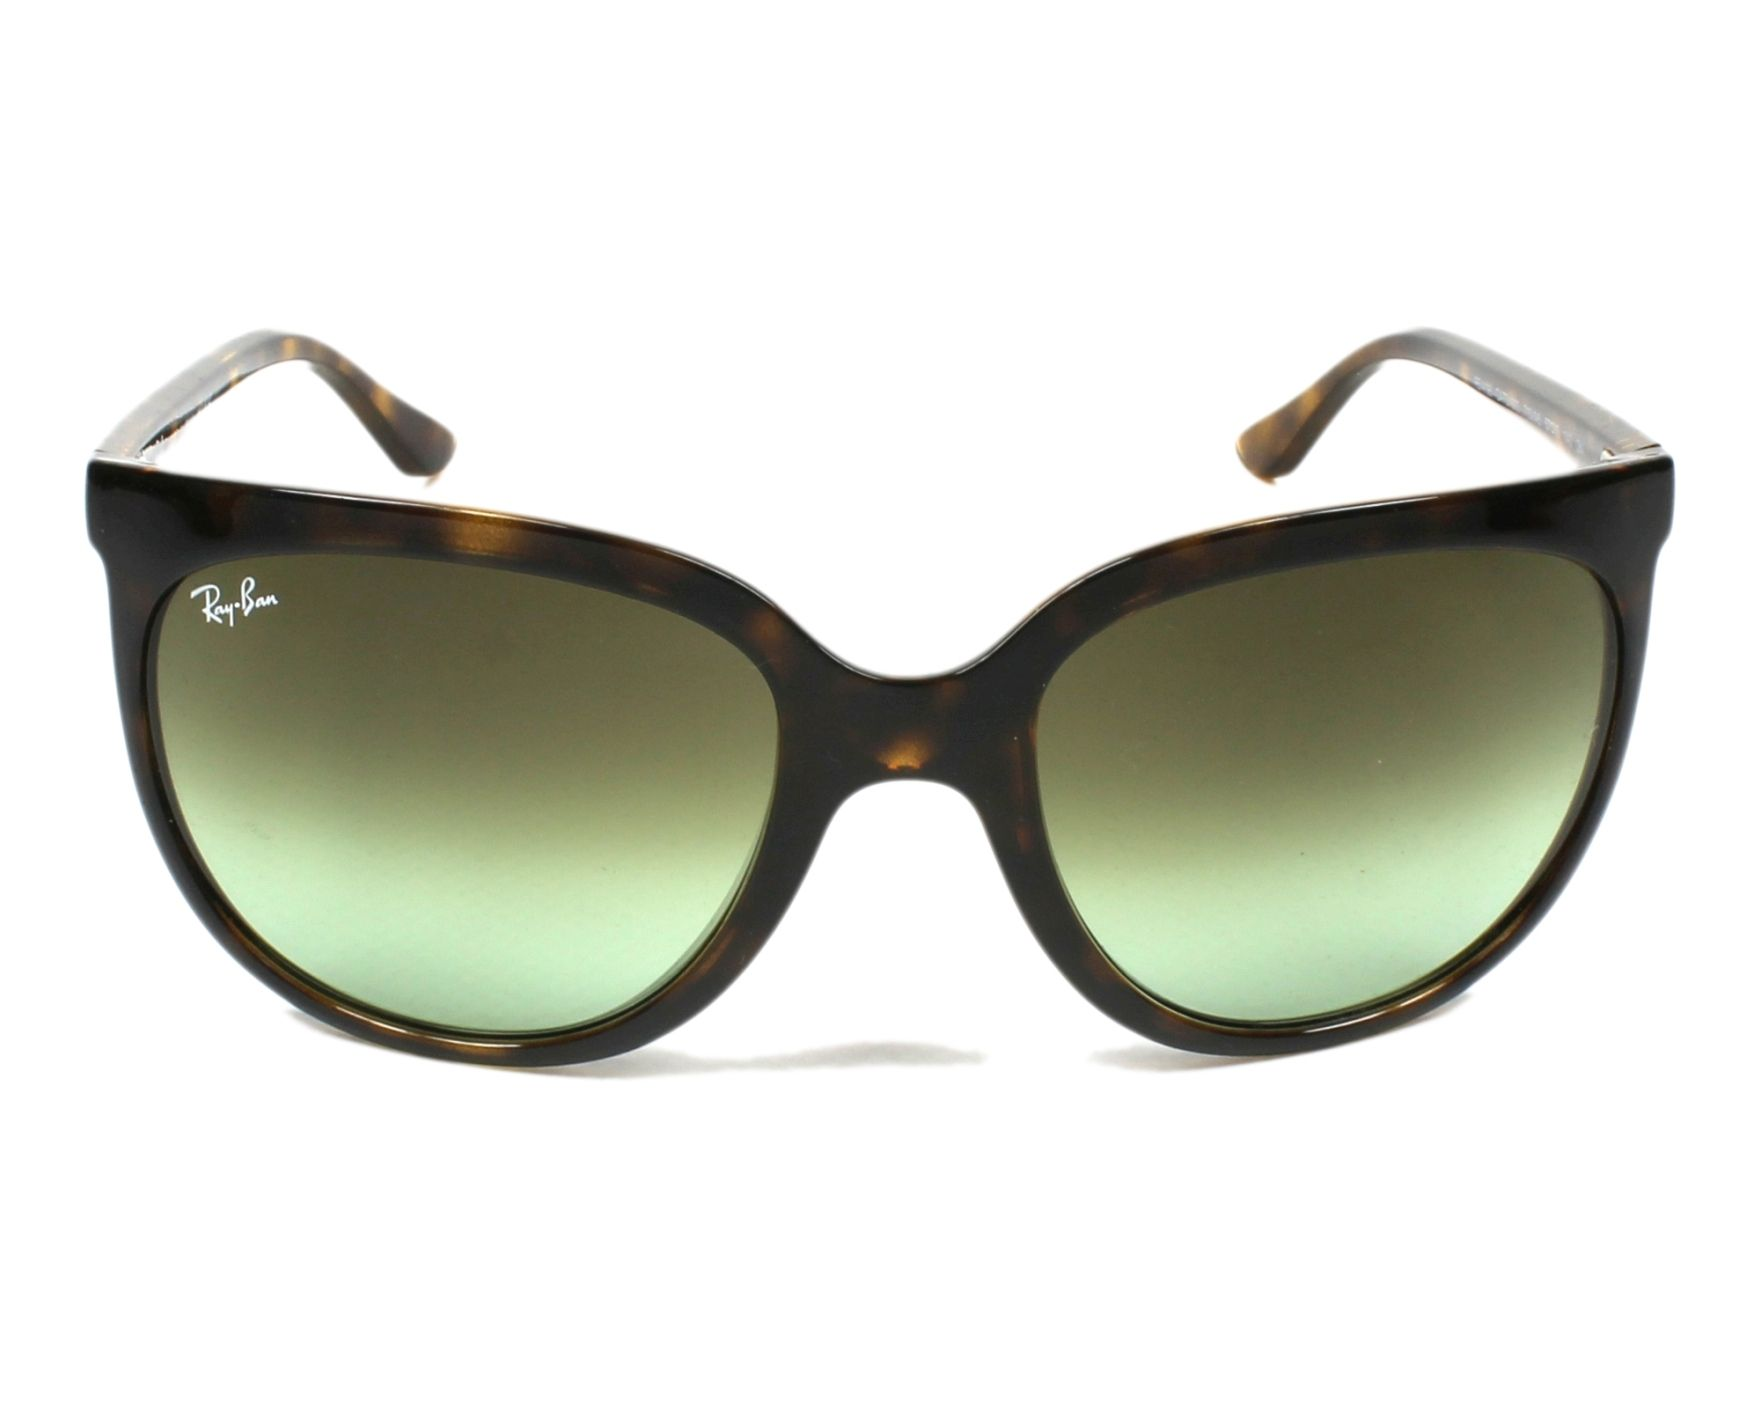 35c066c7b67d34 227e4 fc0e0  coupon sunglasses ray ban rb 4126 710 a6 57 15 havana front  view 75ec3 9733f